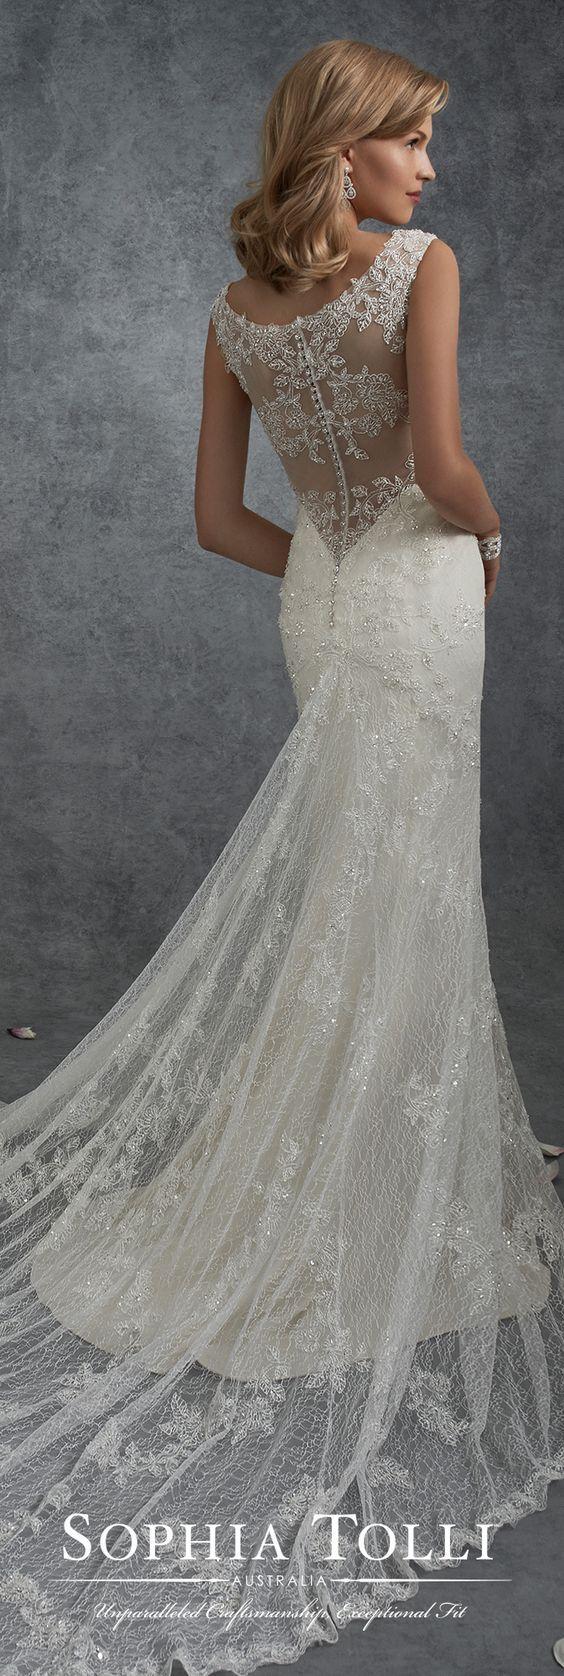 Lace v neck wedding dress  Lace VNeck Wedding Dress with an Illusion Back Sophia Tolli Y